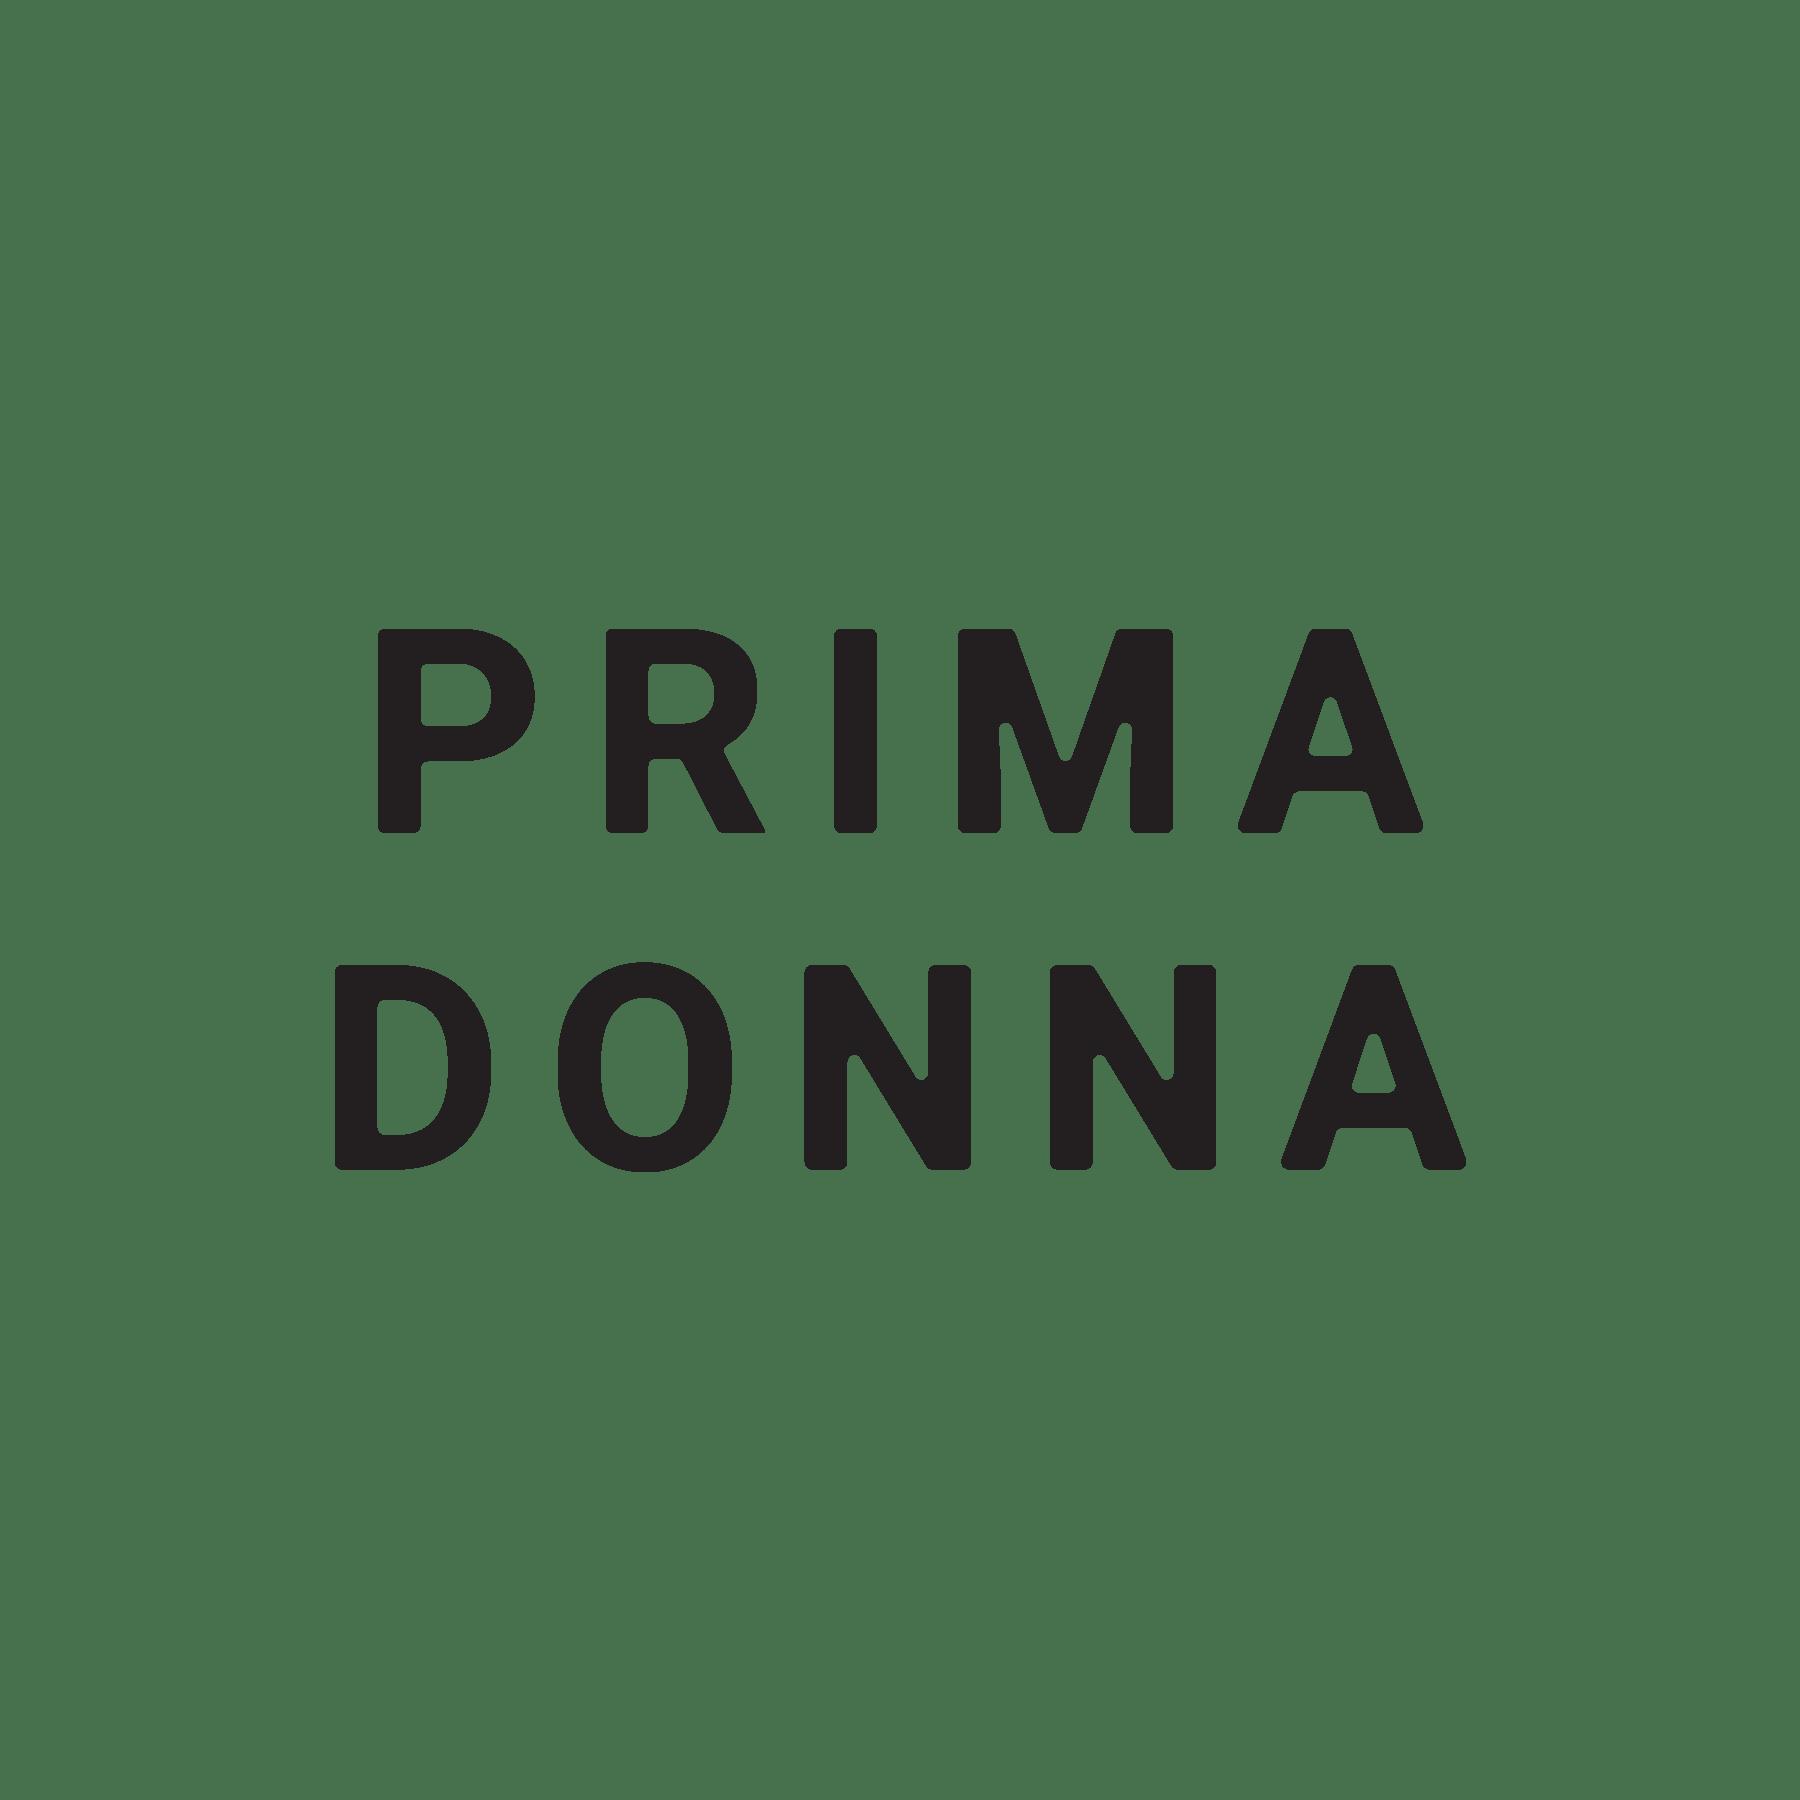 logo-prima-donna